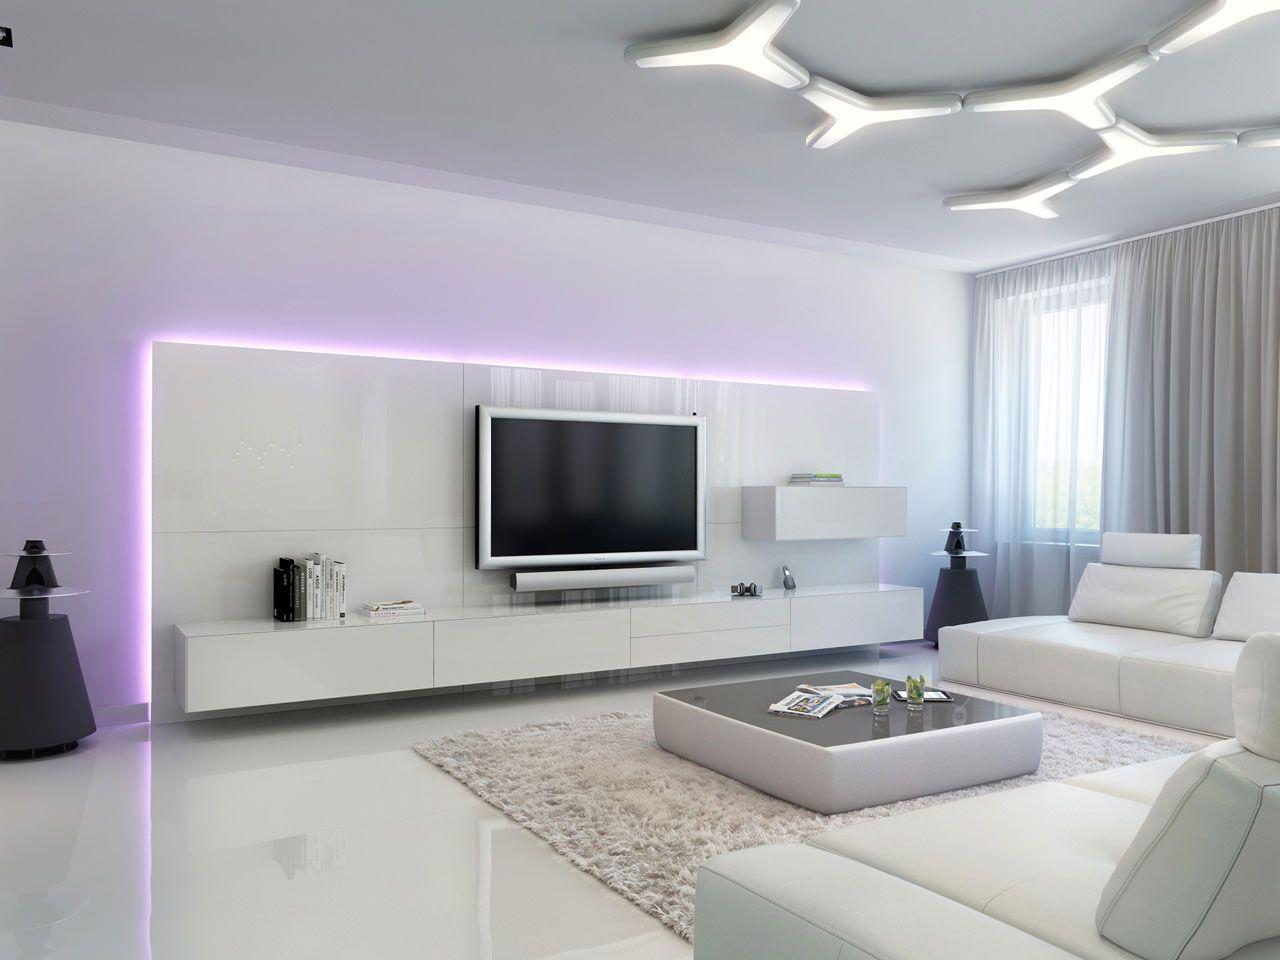 Mobili rampazzo ~ Take a look in 15 enchanting & modern gypsum board tv wall unit.t